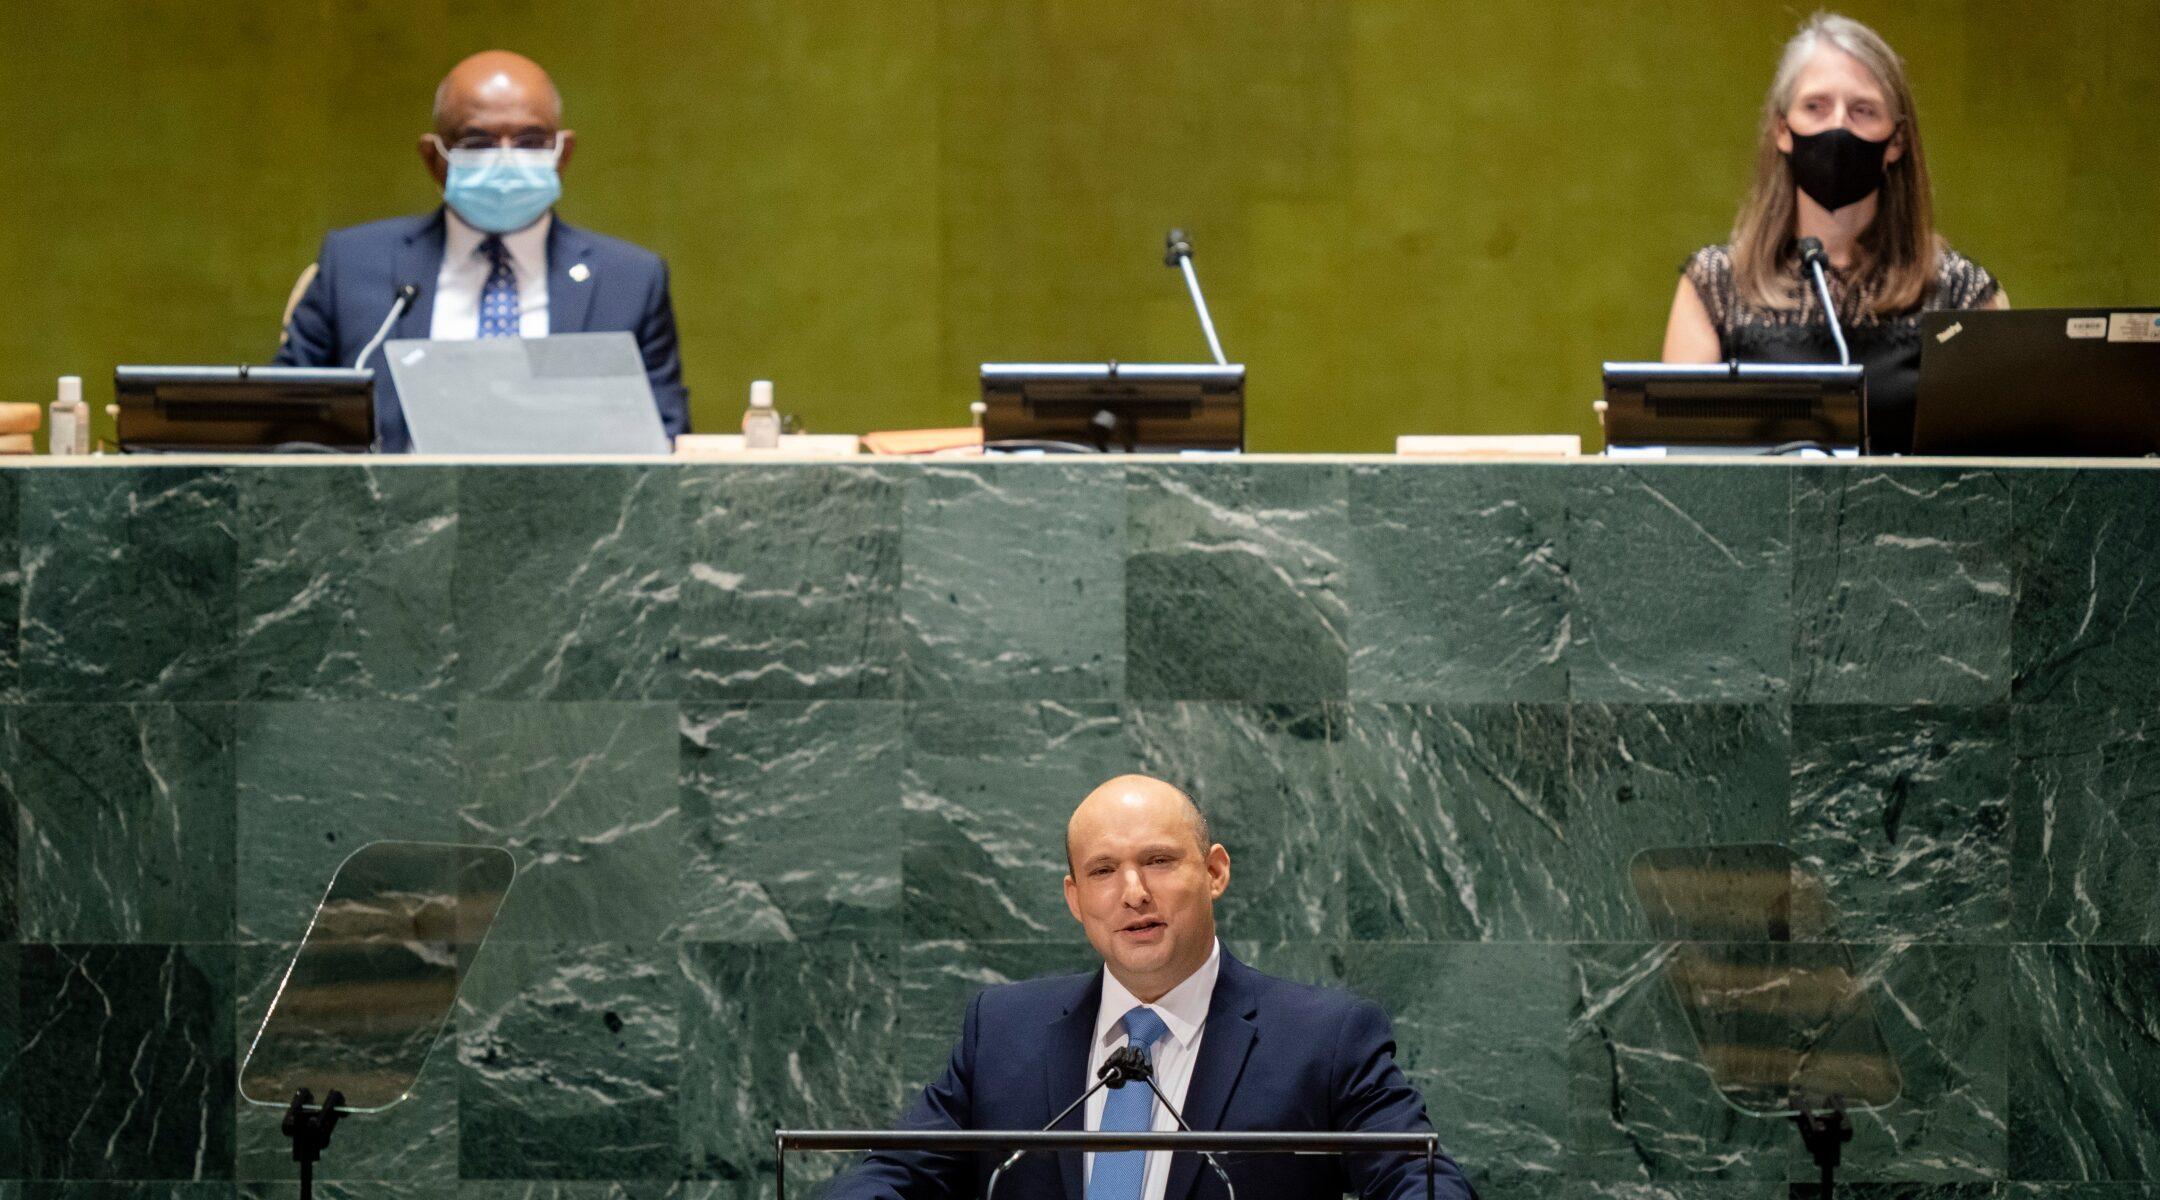 Israeli Prime Minister Naftali Bennett addresses the United Nations General Assembly at UN headquarters in New York City, Sept. 27, 2021. (Photo/JTA-John Minchillo-Pool-Getty Images)